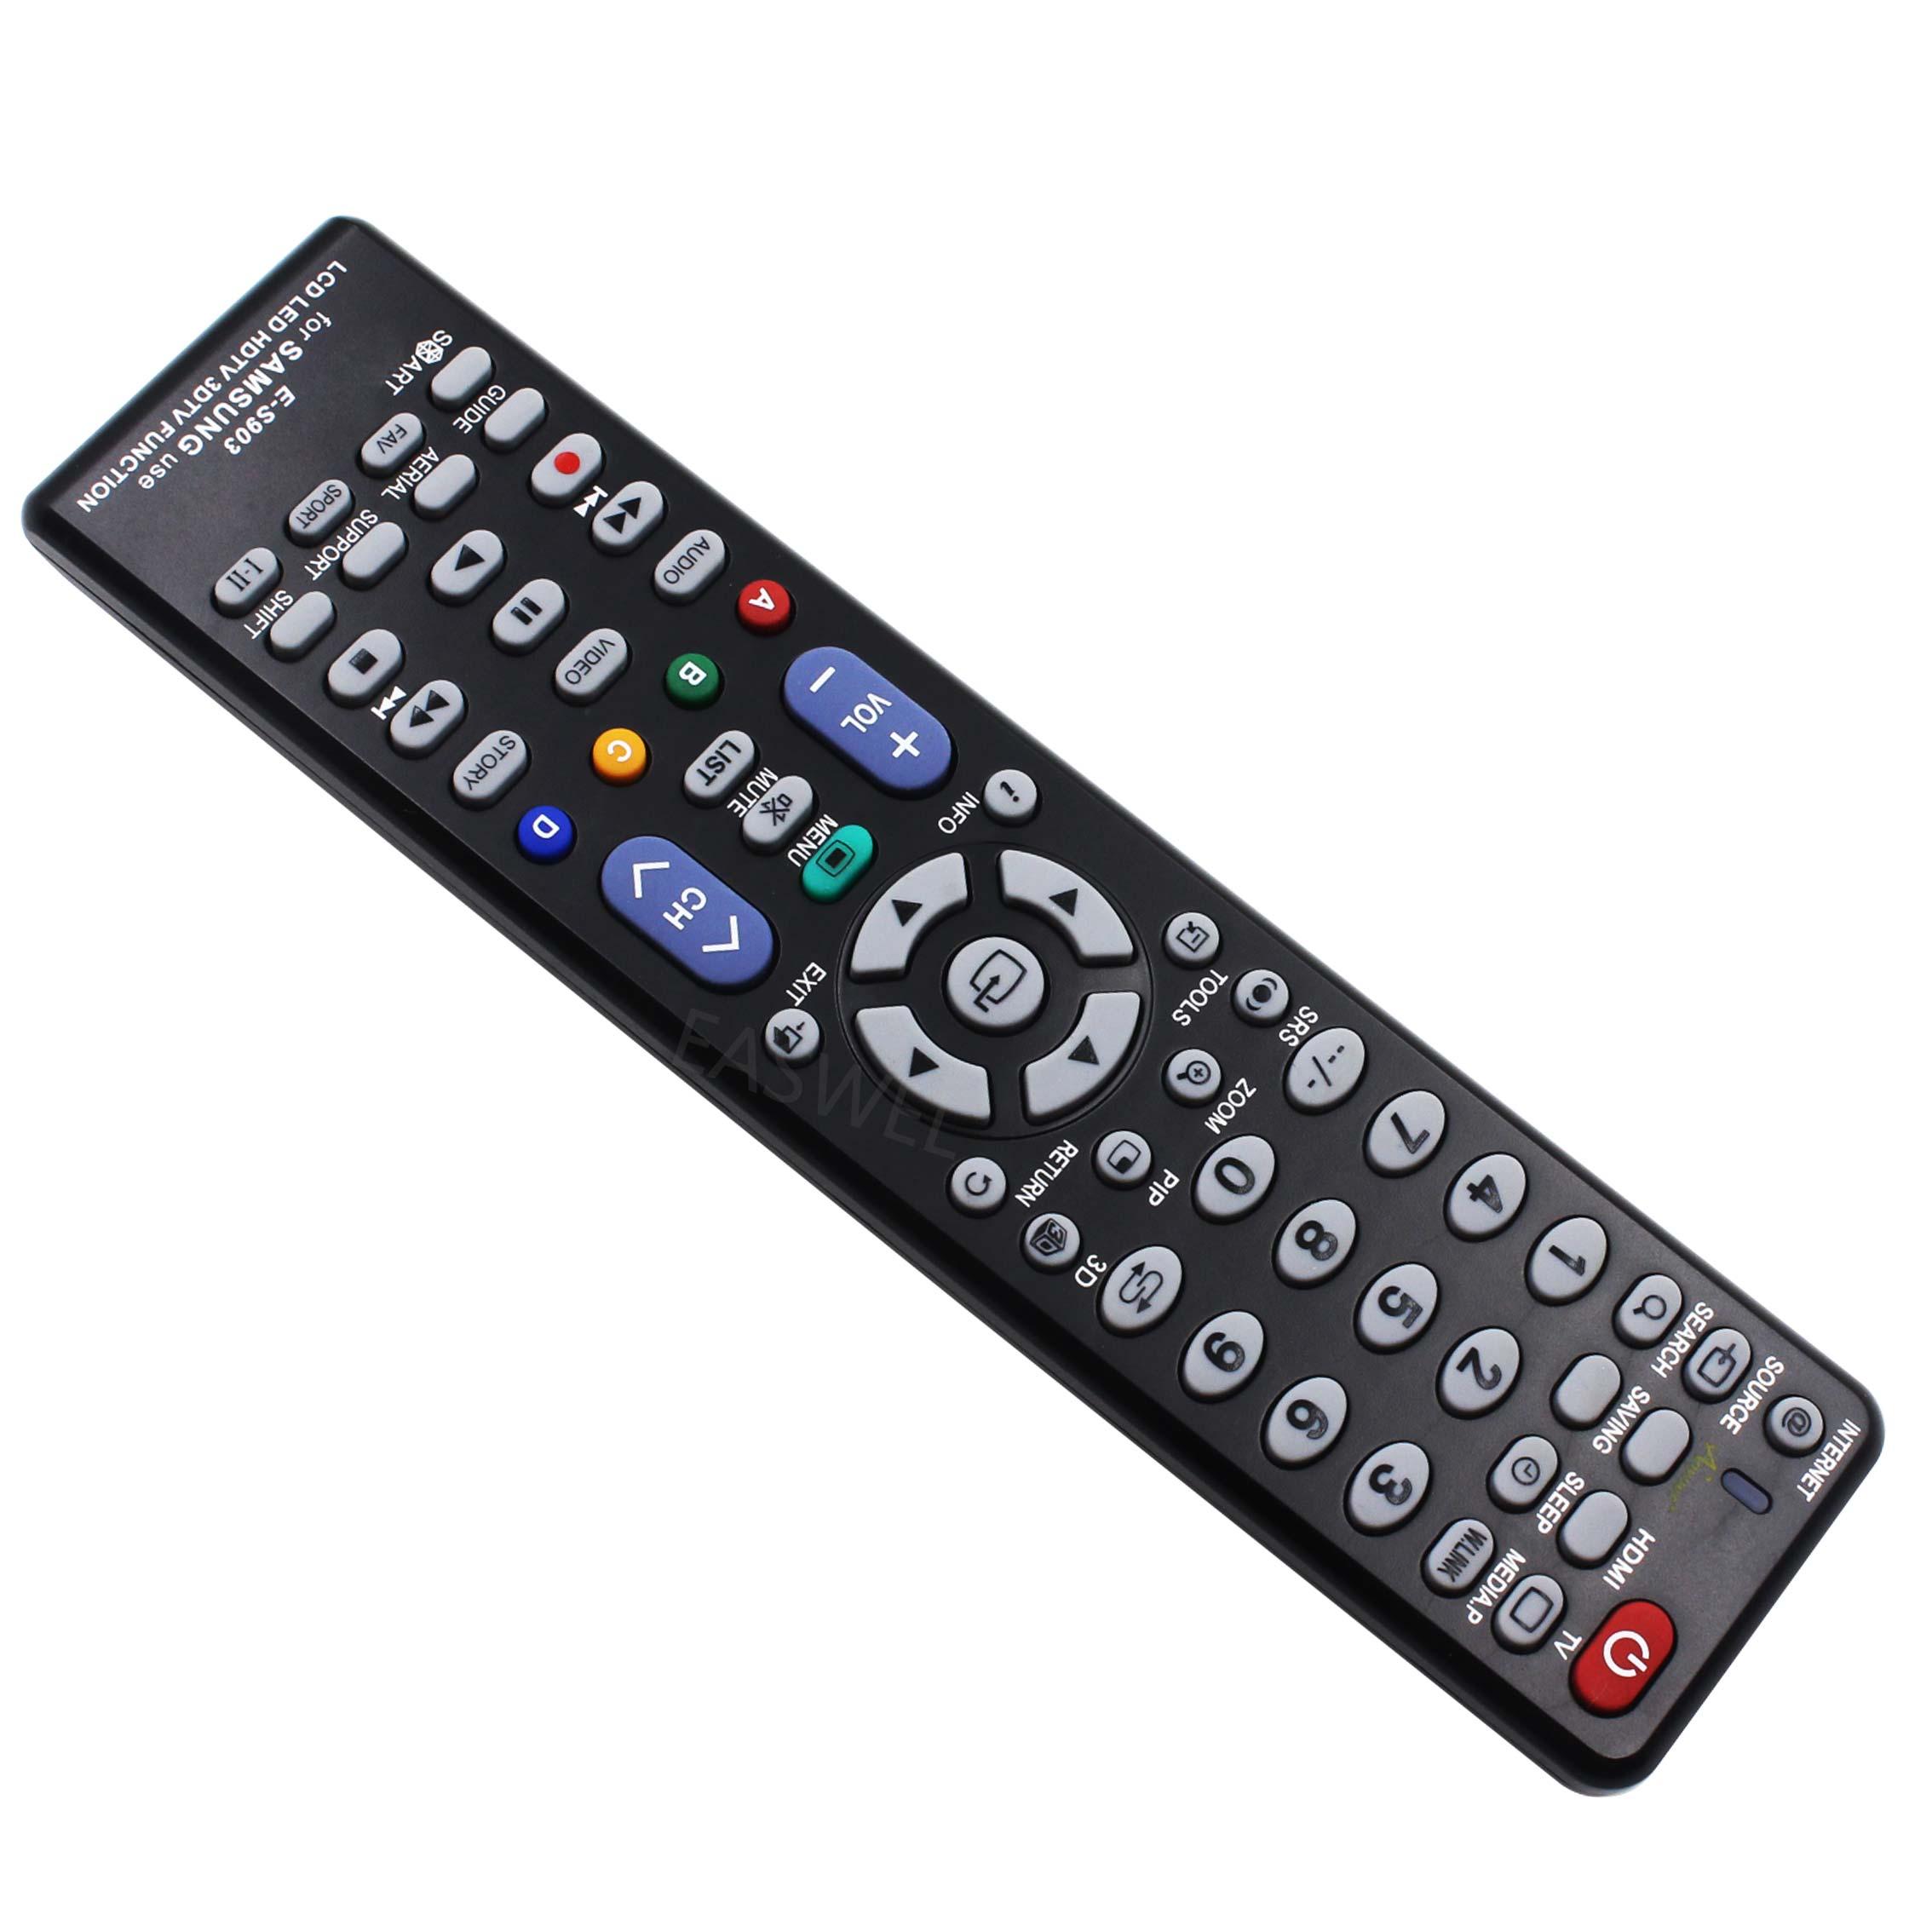 Afstandsbediening voor Samsung EH4003 EH5000 F4000 F5300 F5500 F6300 F6400 F7100 F8500 FH5000 FH6003 FH6030 FH6200 H4000 H5003 H5201